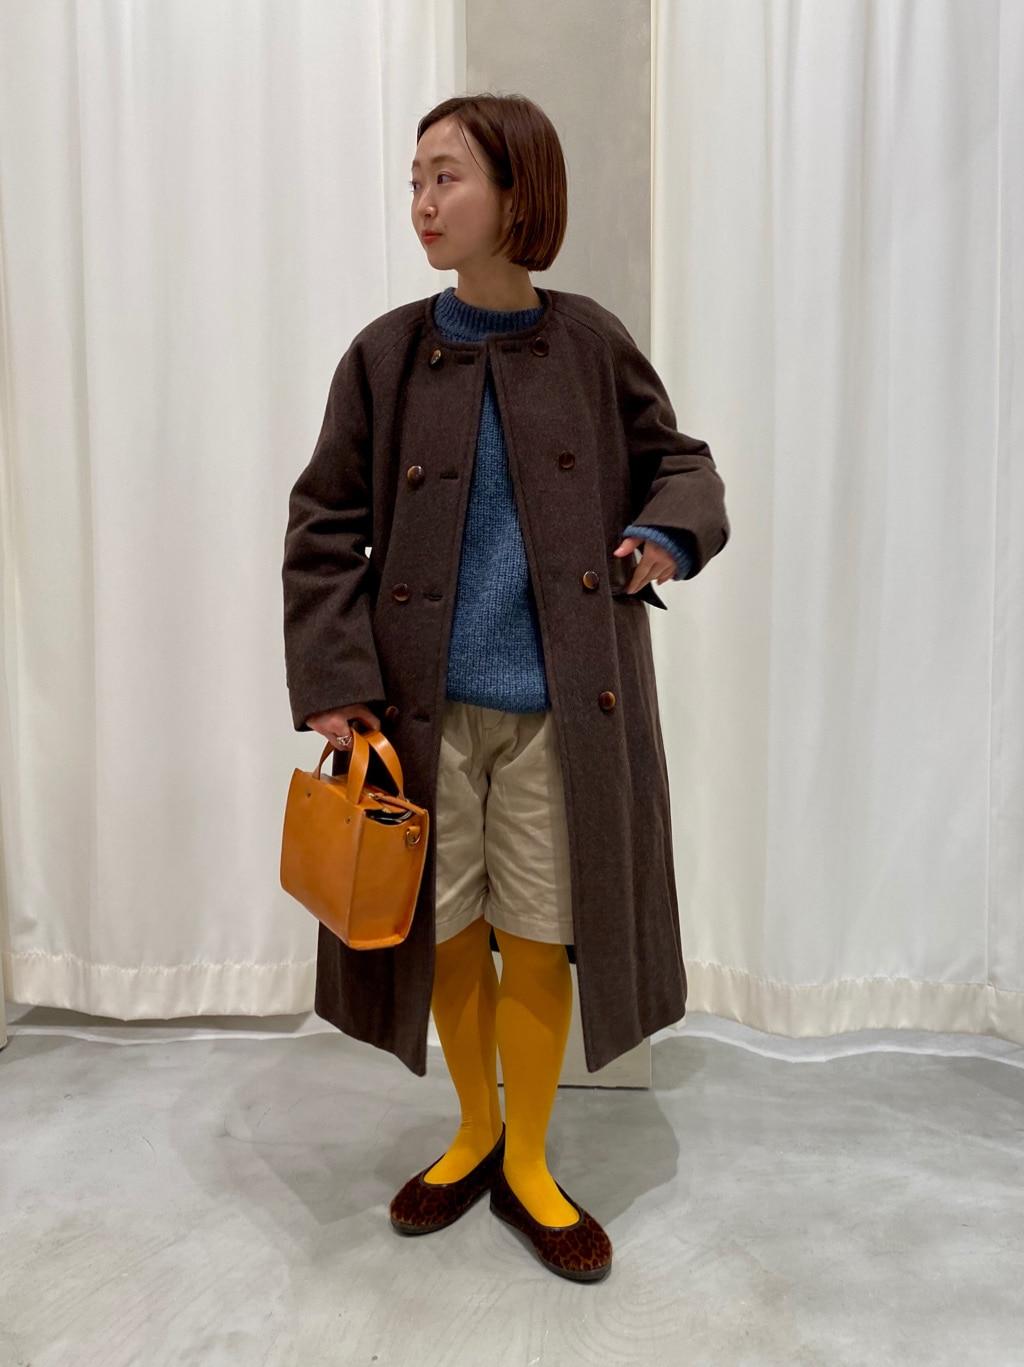 - CHILD WOMAN CHILD WOMAN , PAR ICI 東京スカイツリータウン・ソラマチ 身長:150cm 2020.11.27